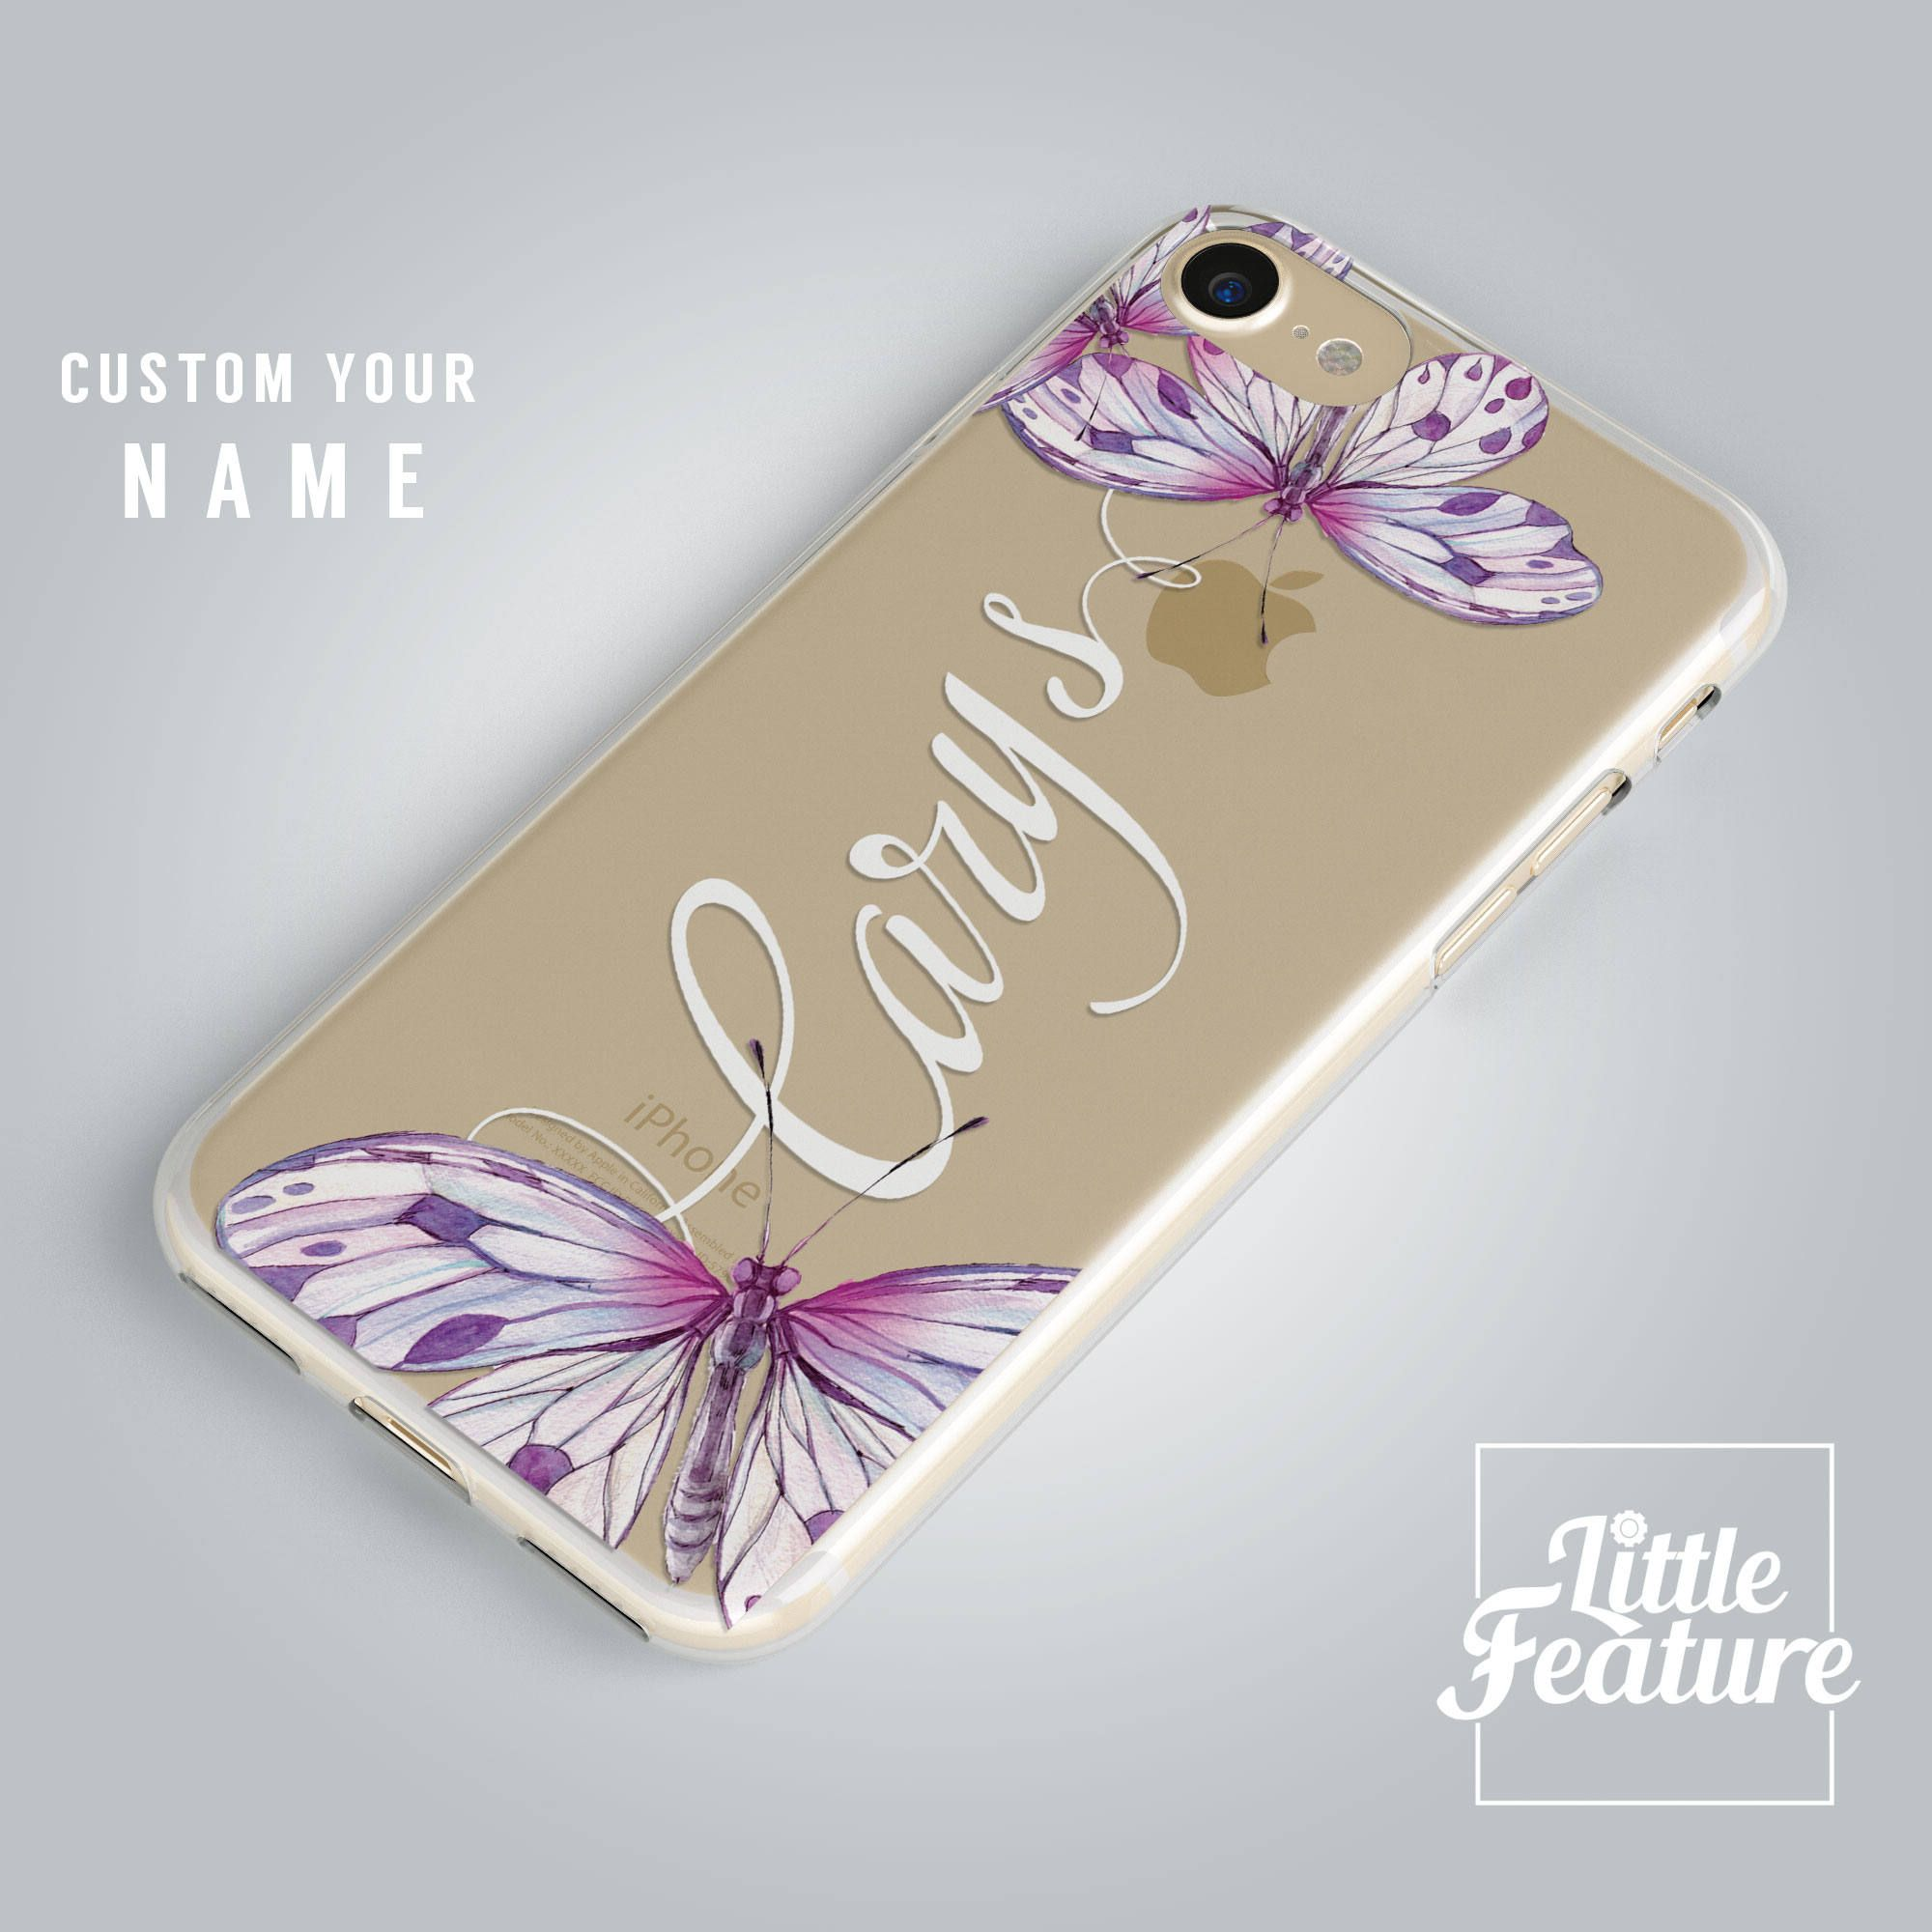 personalised iphone 7 cases purple